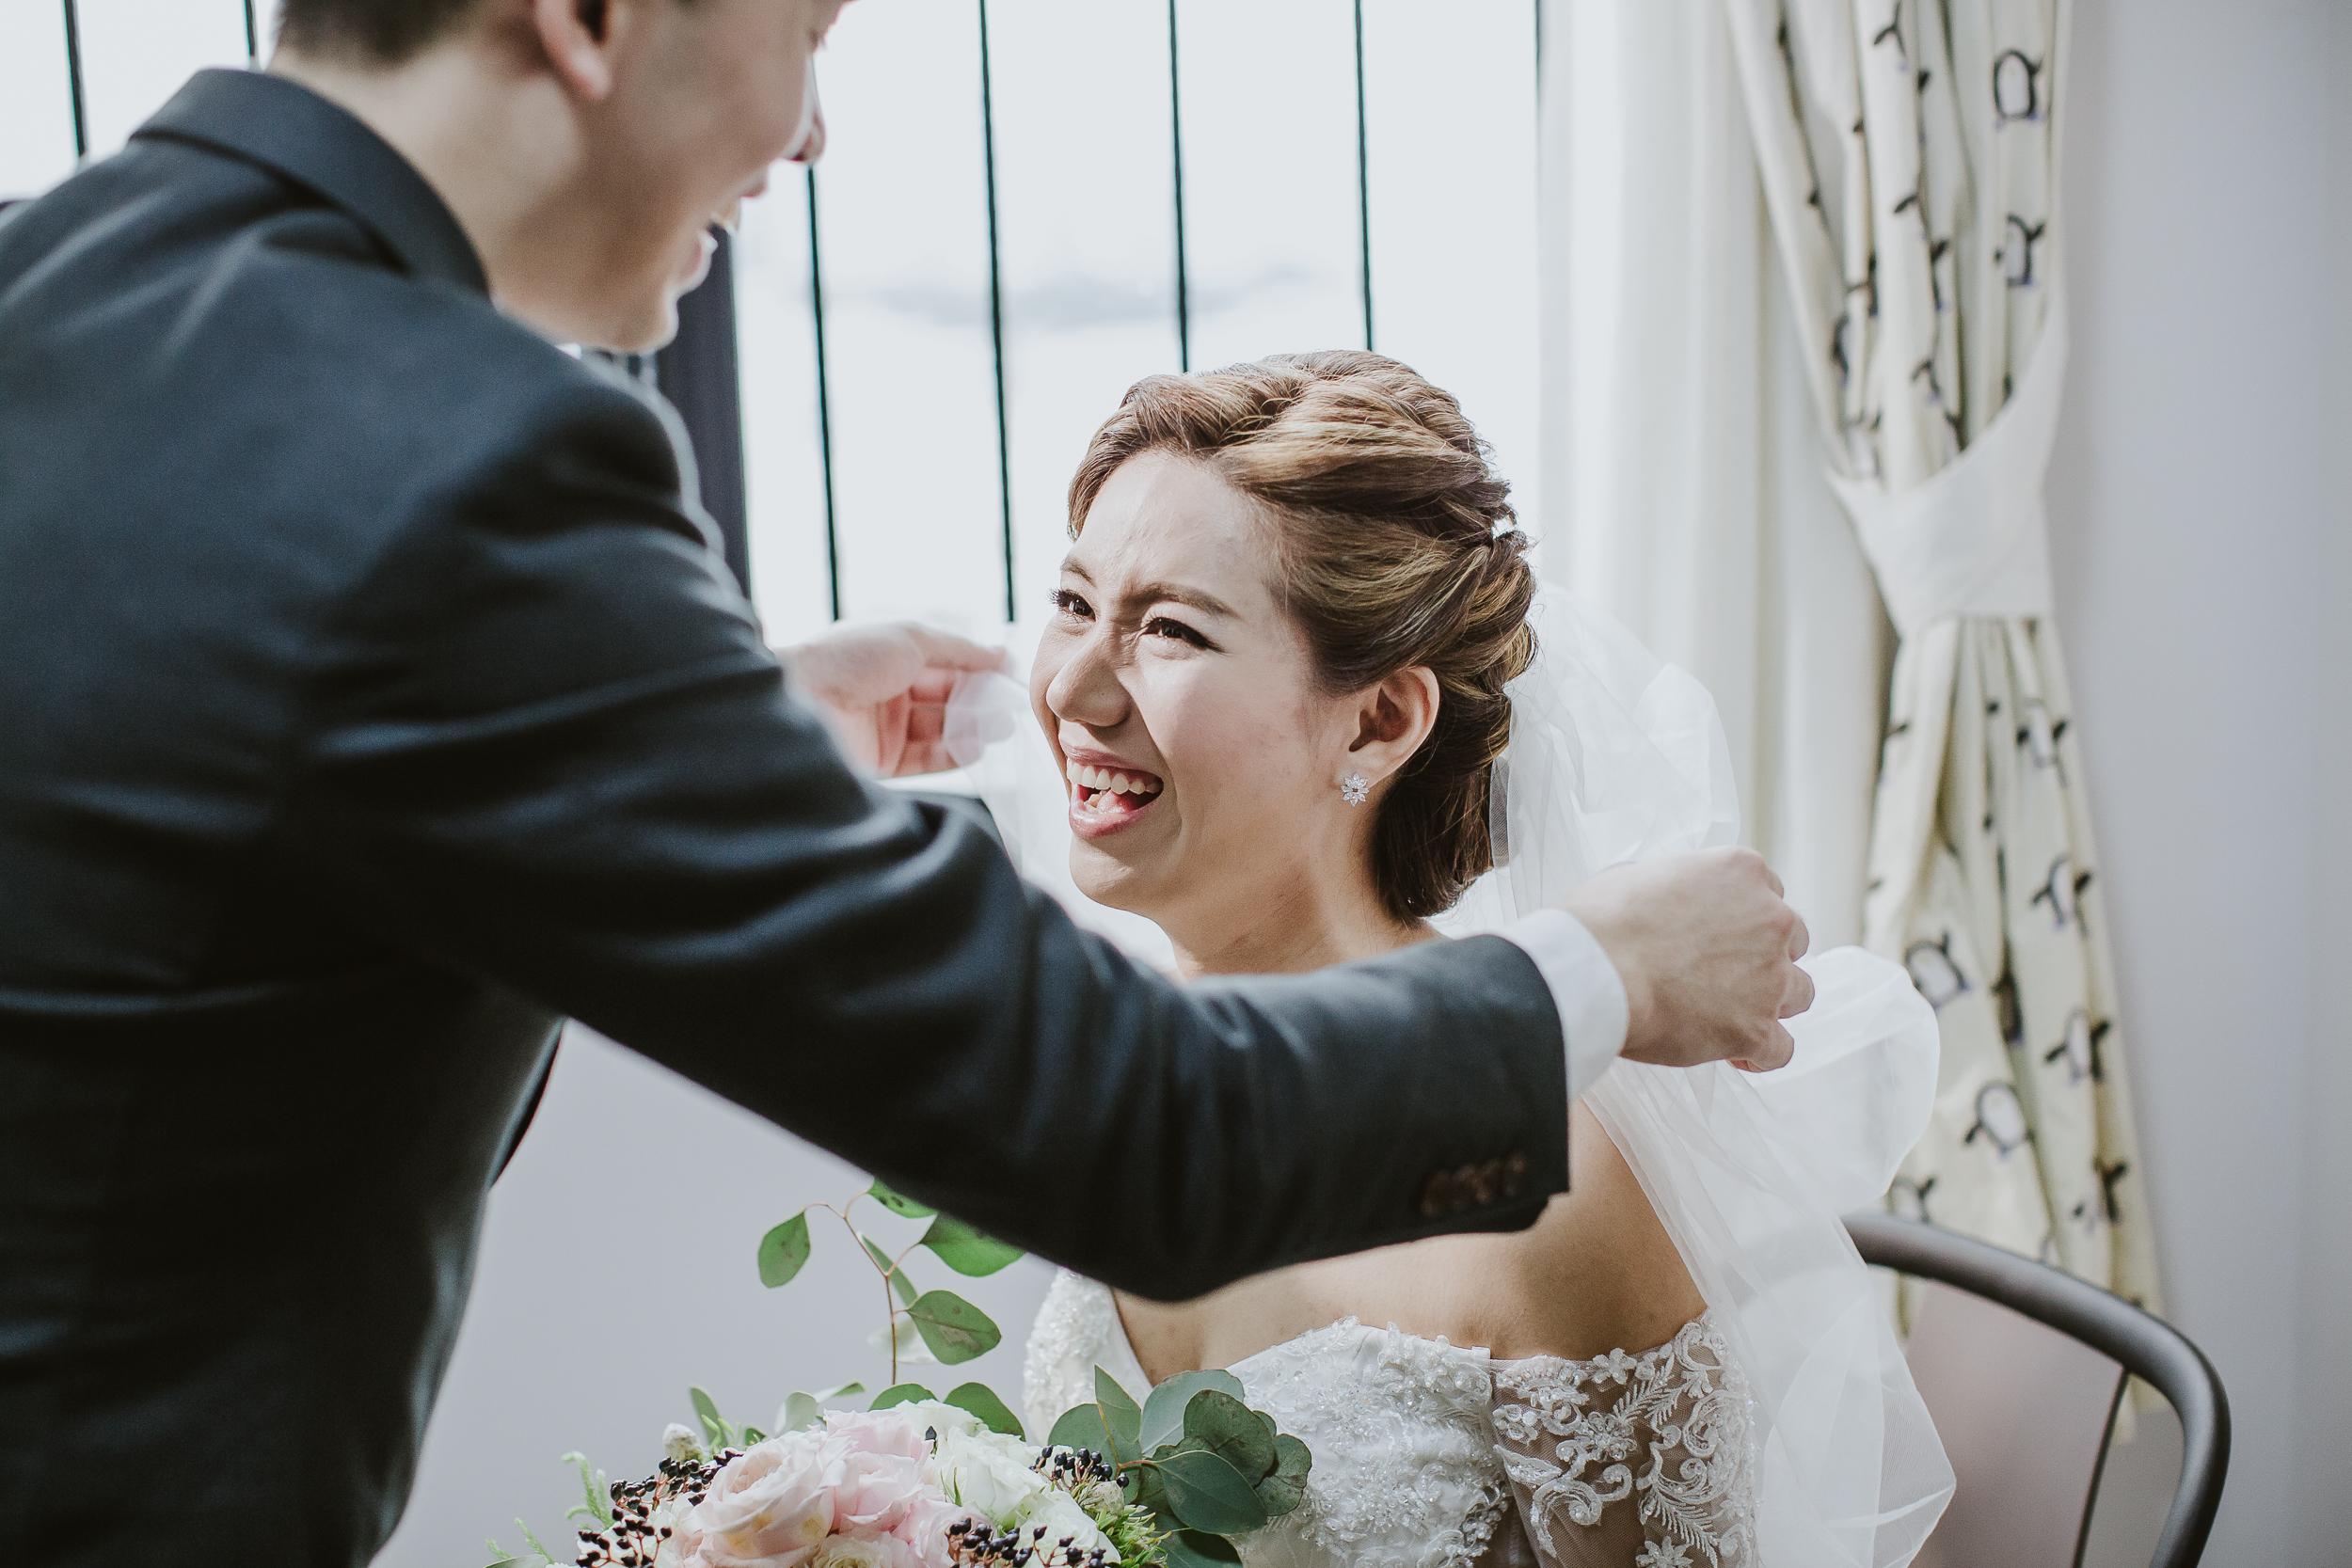 Singapore+Actual+Day+Wedding+Photographer+Raffles+Town+Club+Jeremiah+Christina-0034.jpg